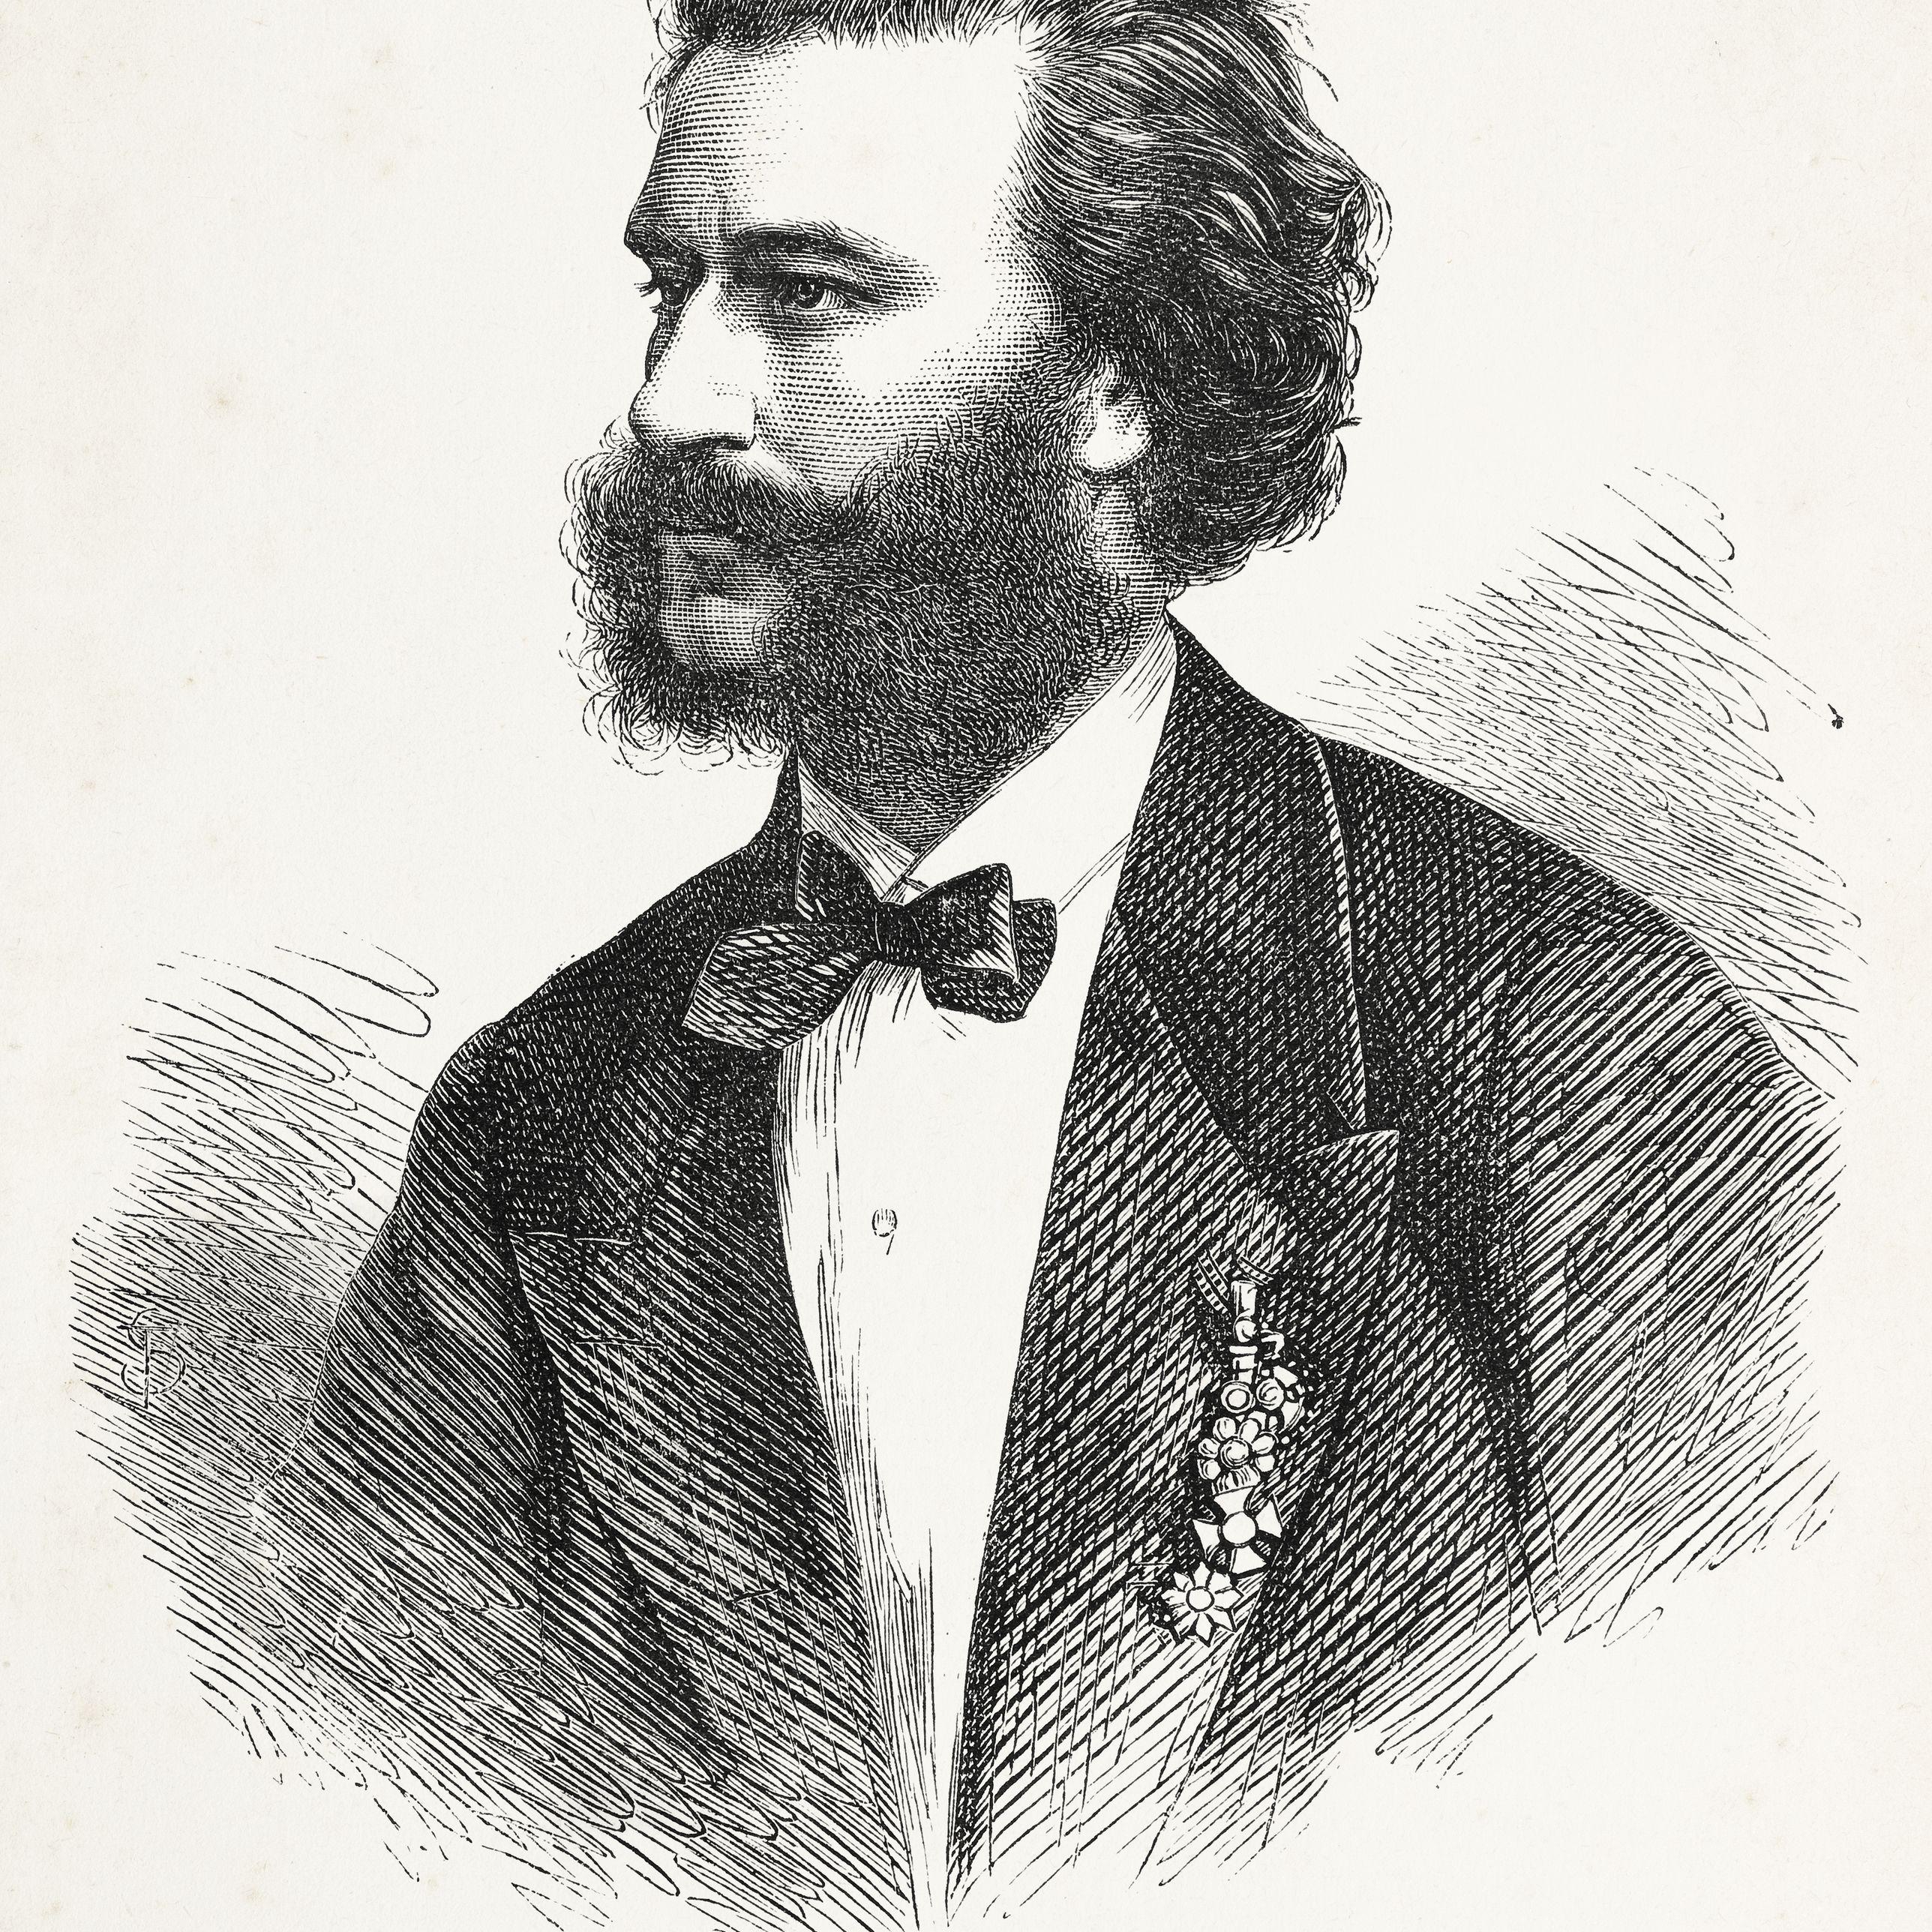 Engraving of austrian composer Johann Strauss from 1867